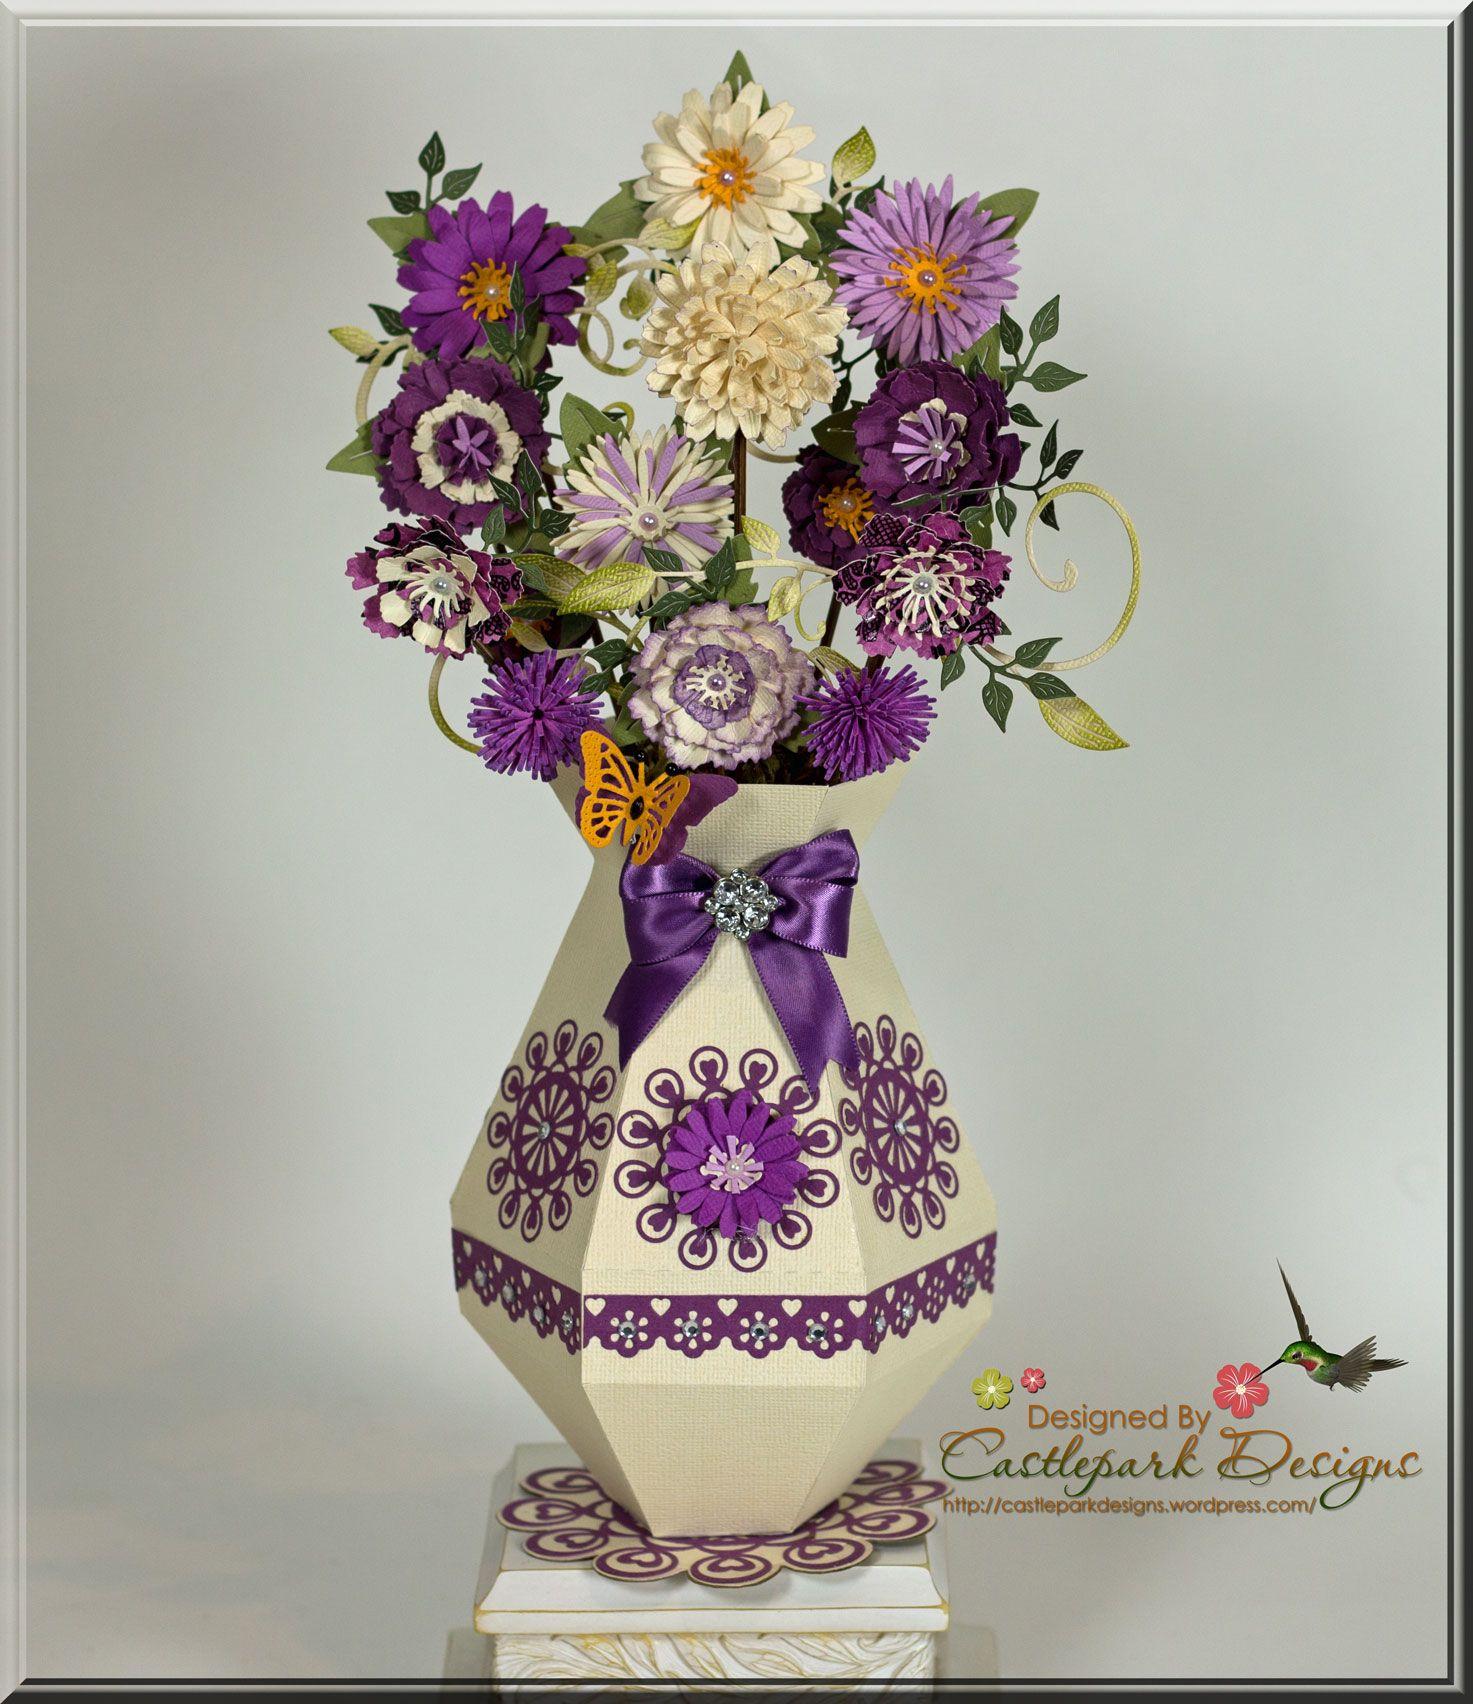 Flower Vase – Pretty in Purple! | Quilling, Tutorials and Quilling ... for Paper Quilling 3d Flower Vase  111ane